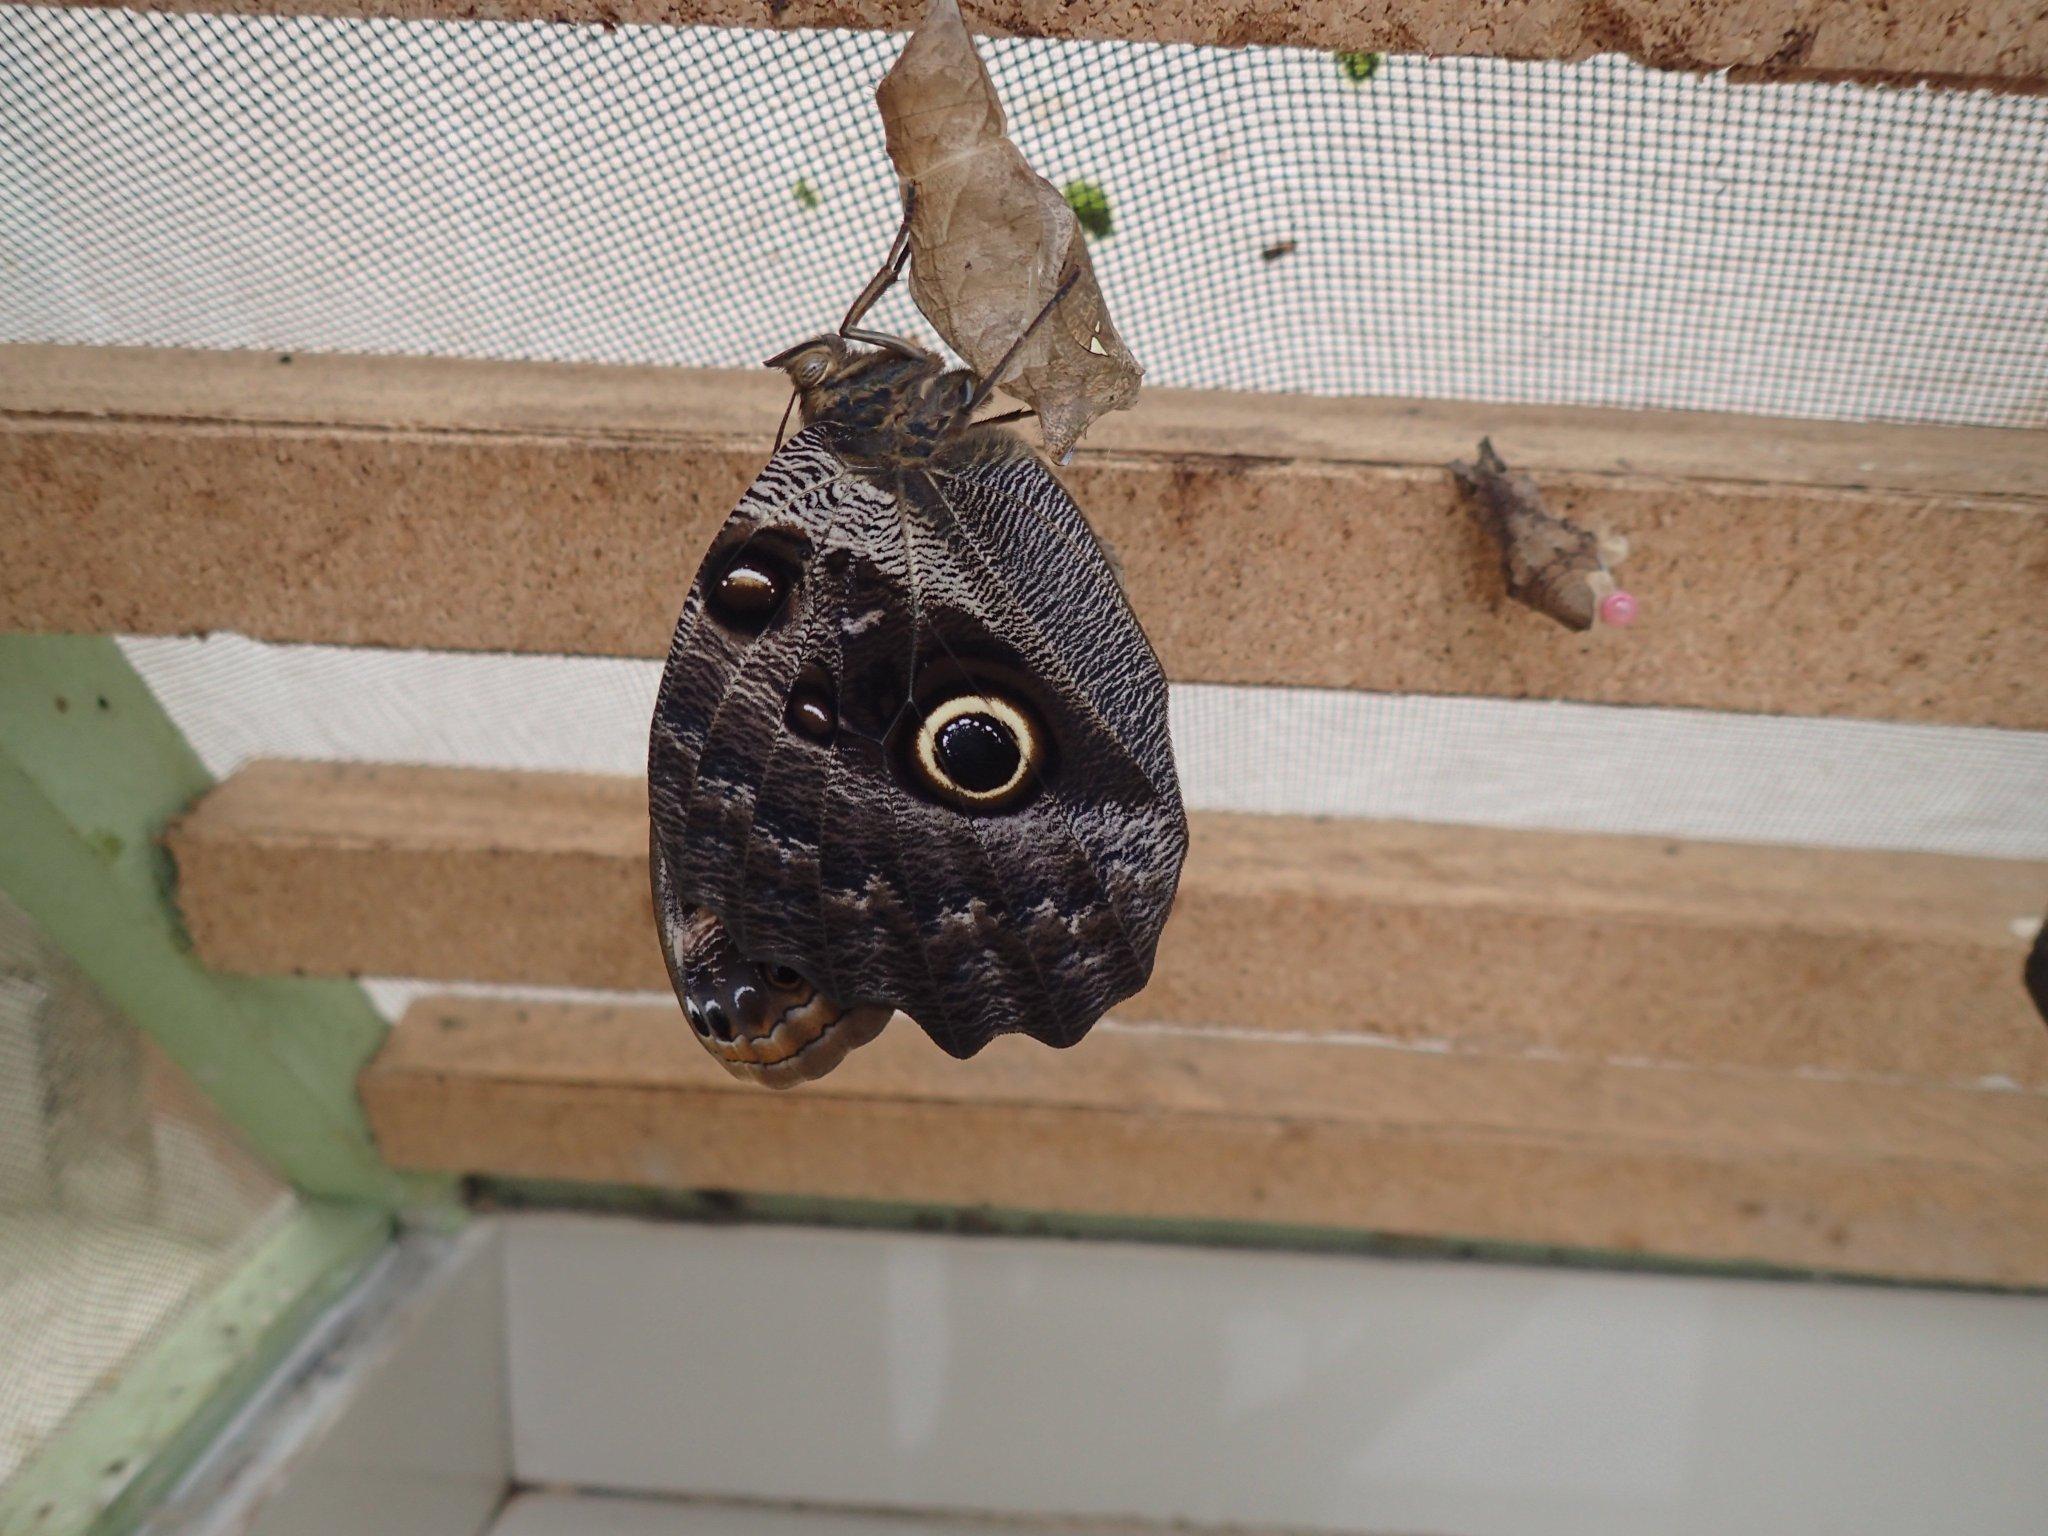 A newly emerged Owl Eye https://t.co/zHBAyKysfq